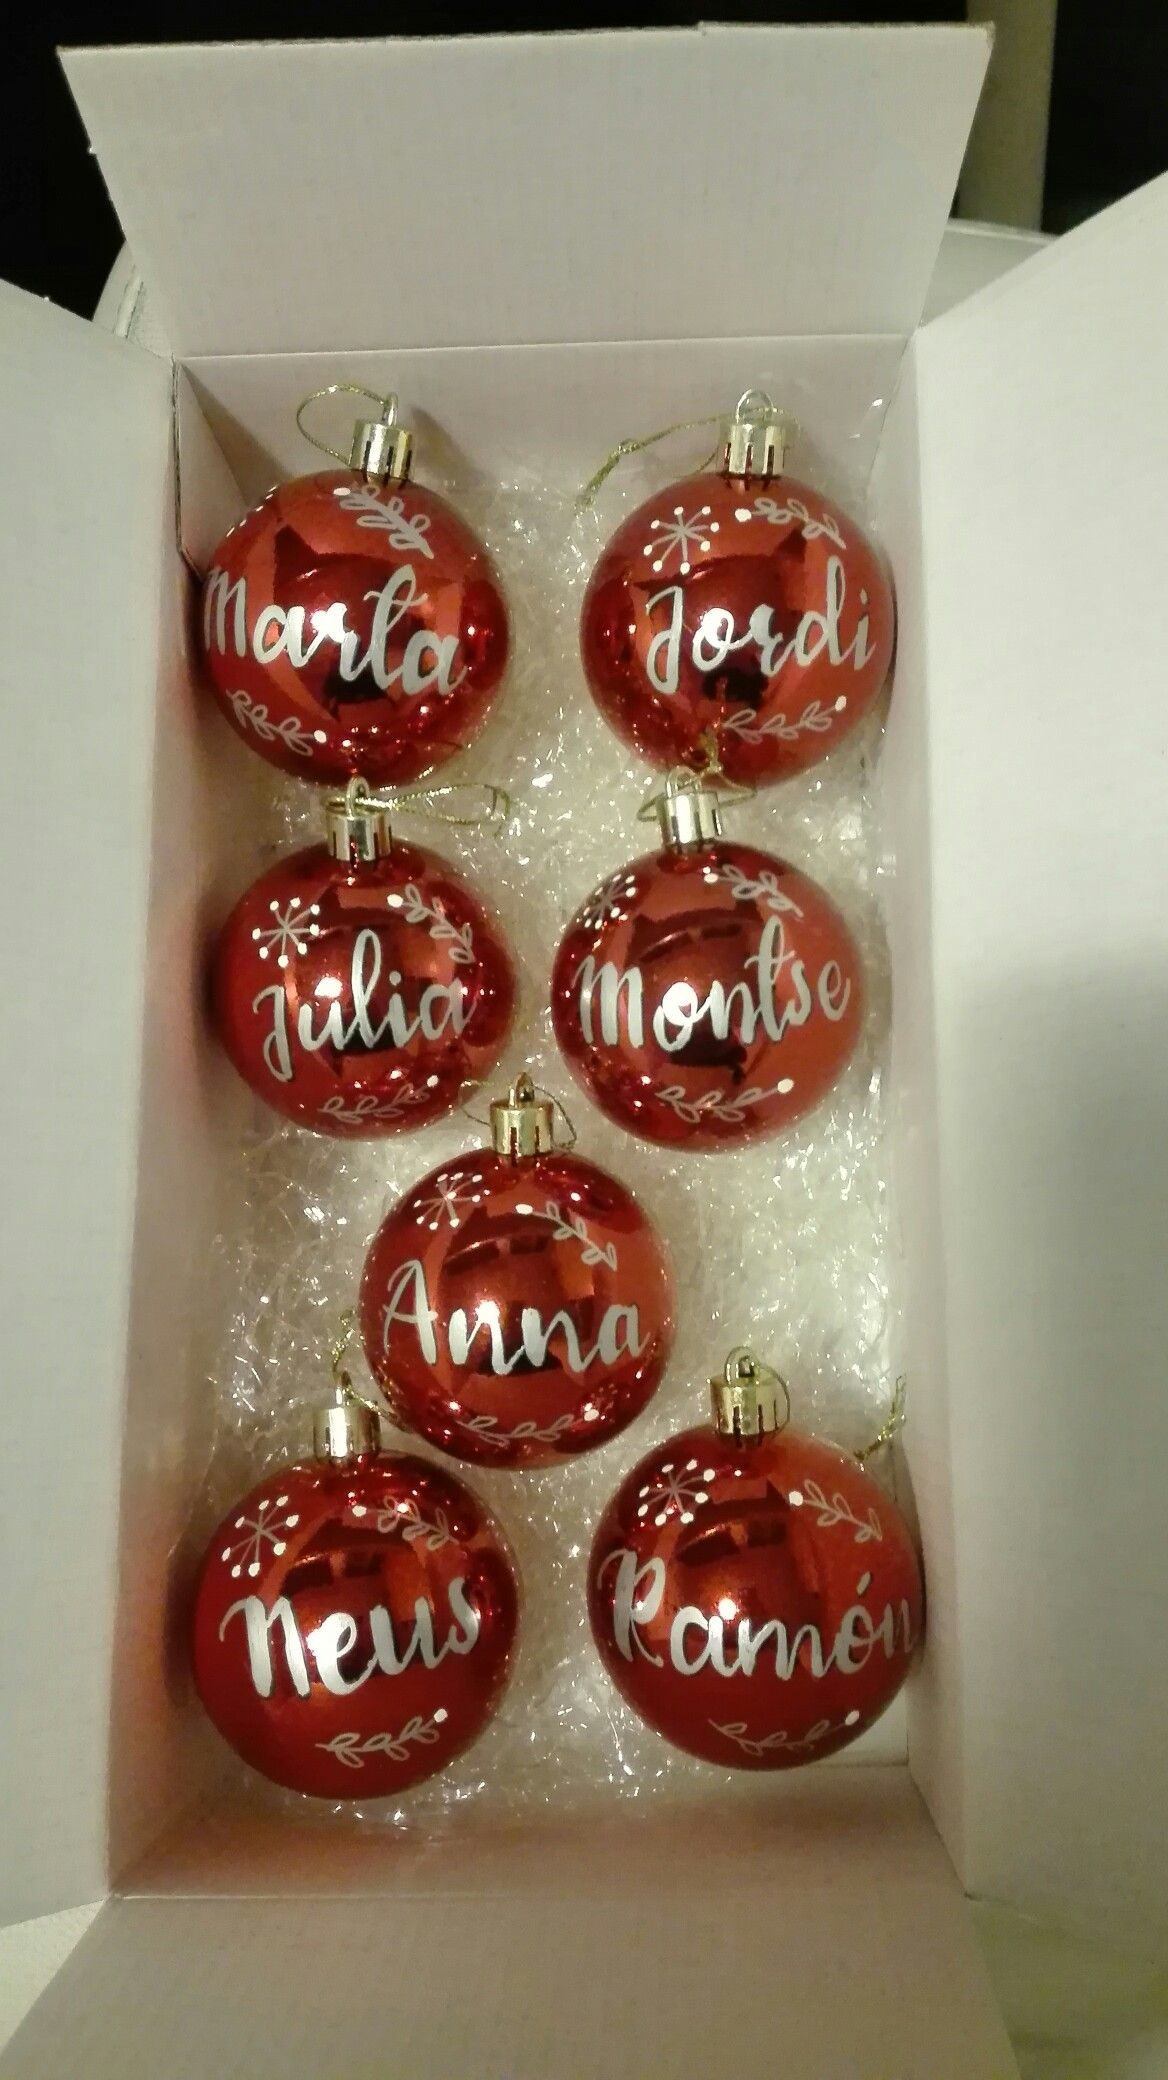 e7a28252ac26e Bolas de Navidad personalizadas con nombre . Hechas a mano por mi  utilizando rotulador permanente metalizado. Inma Oliver  makuoliver